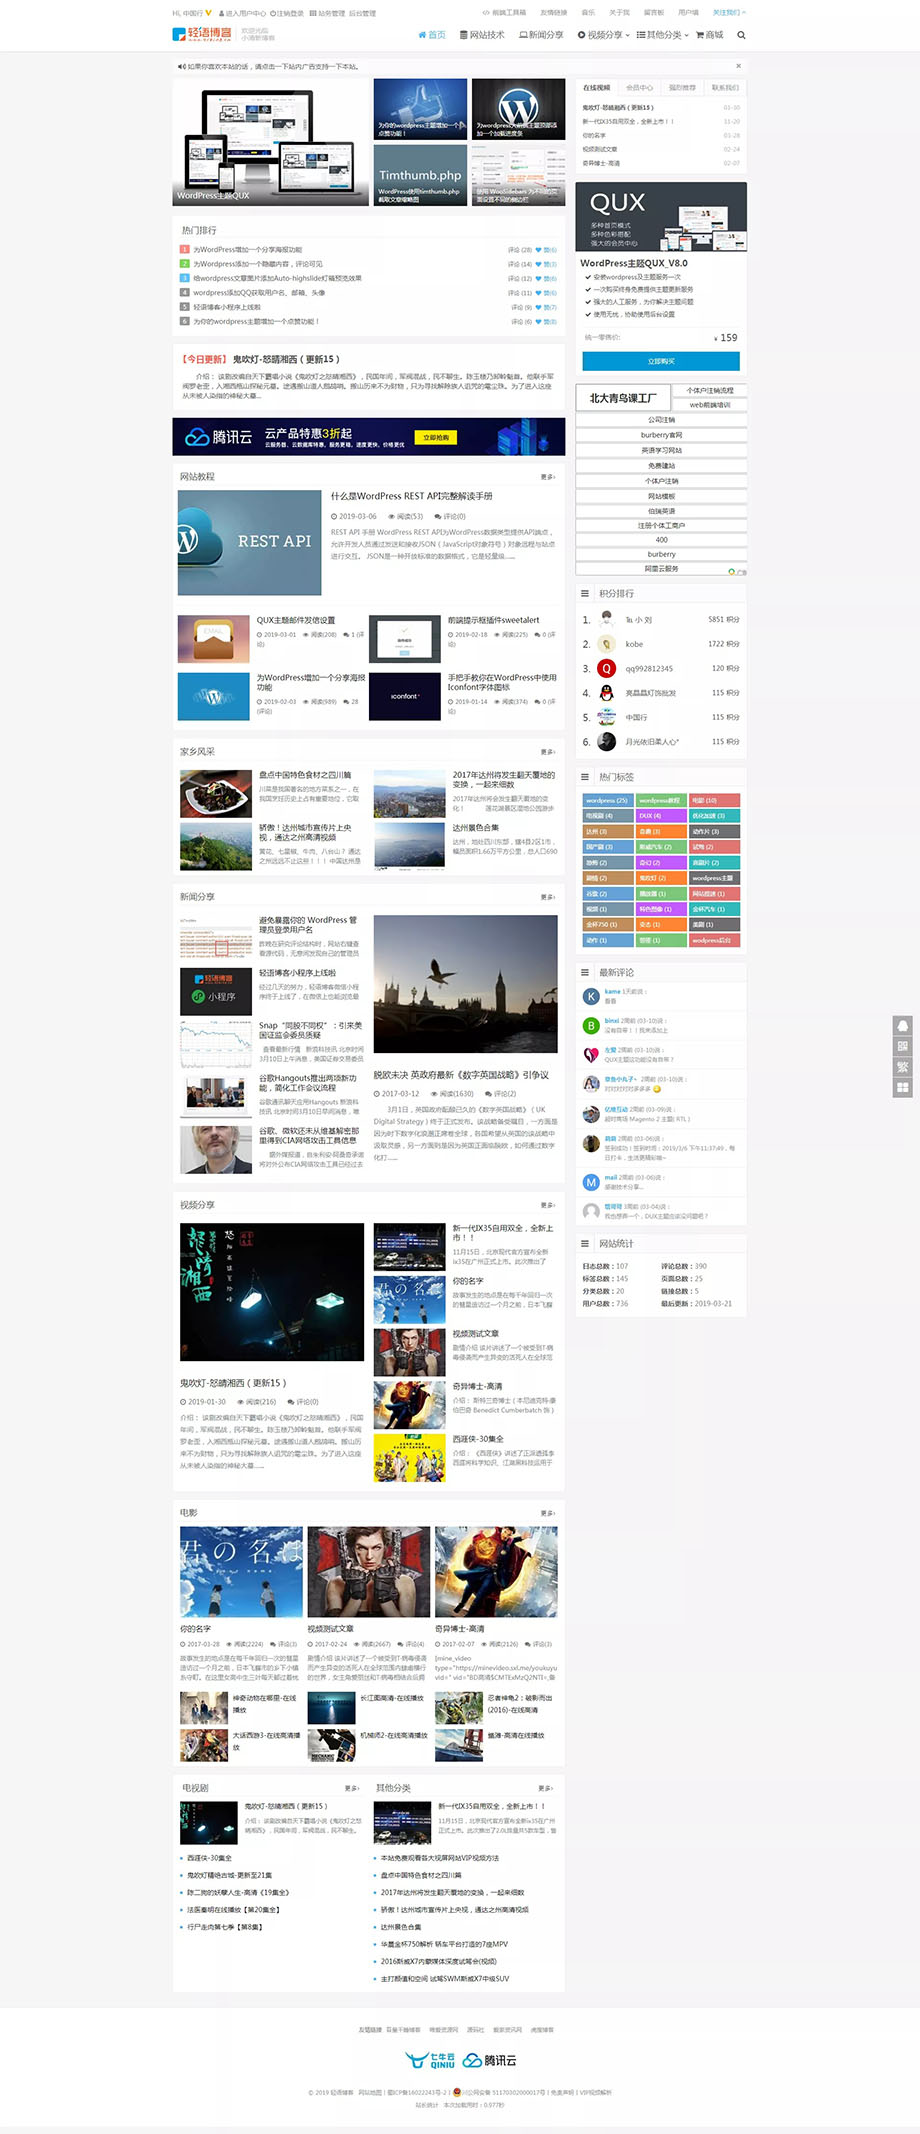 WordPress主题QUX9.1.5全开源版-DUX二开加强主题下载 第1张